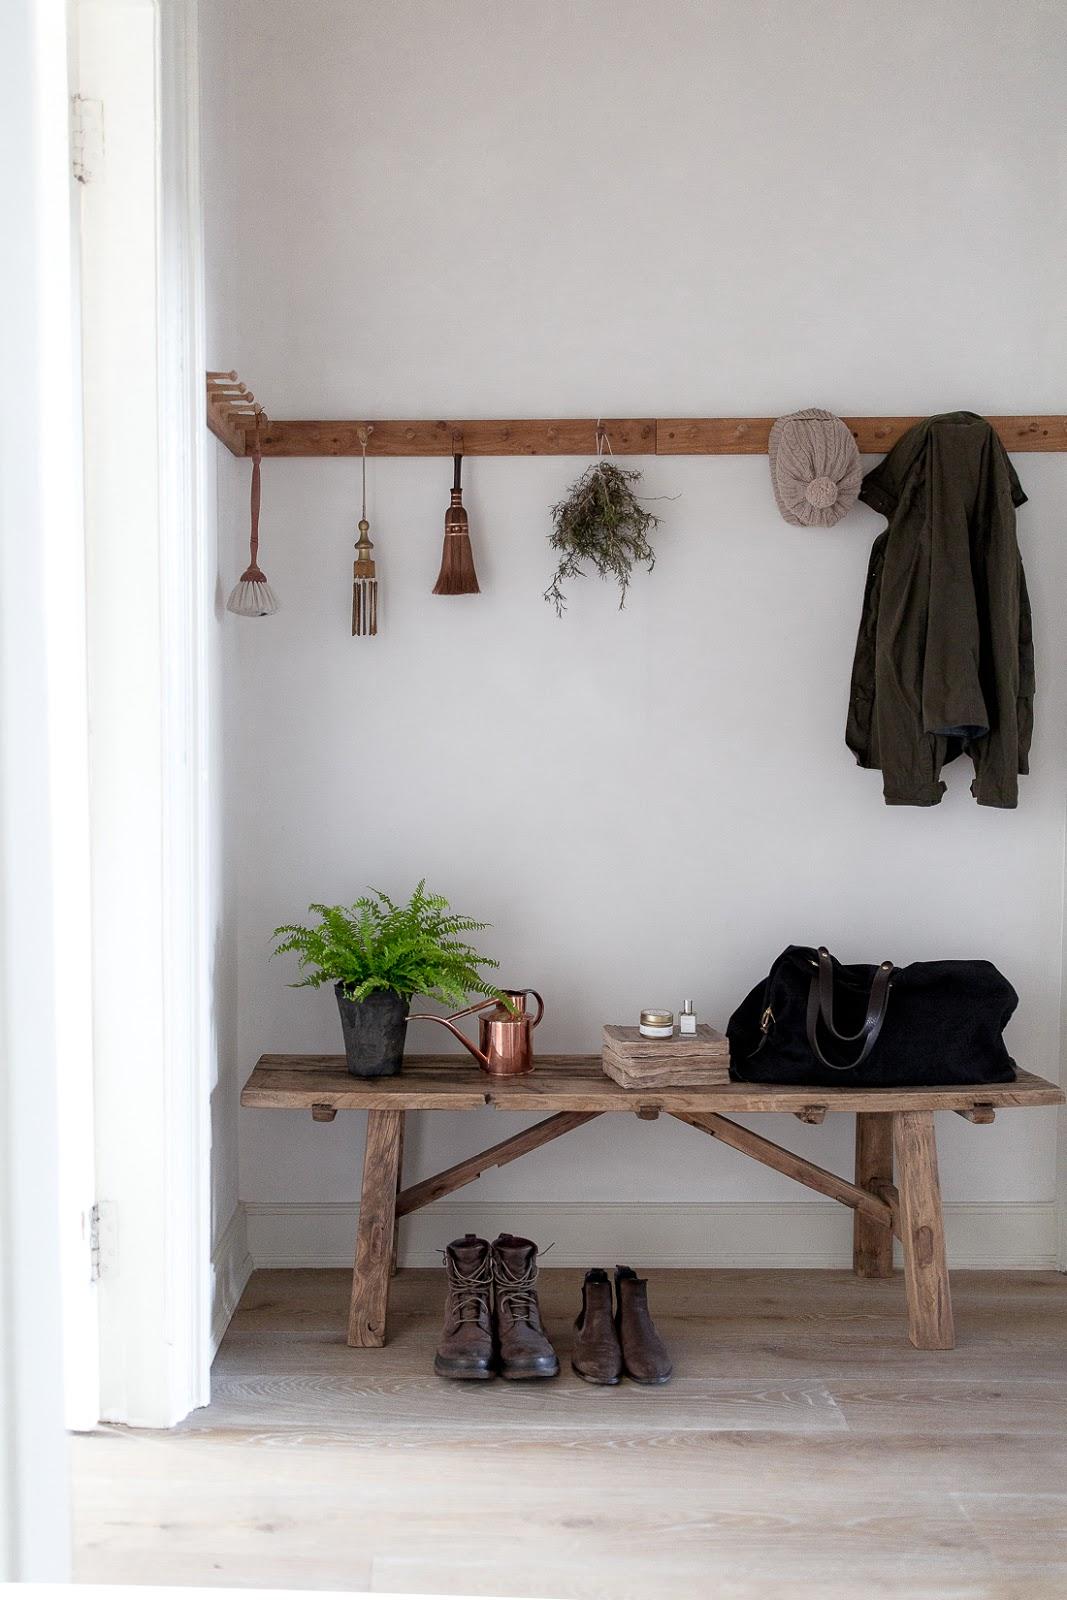 ilaria fatone - a comforting and minimal home - the minimal entrance